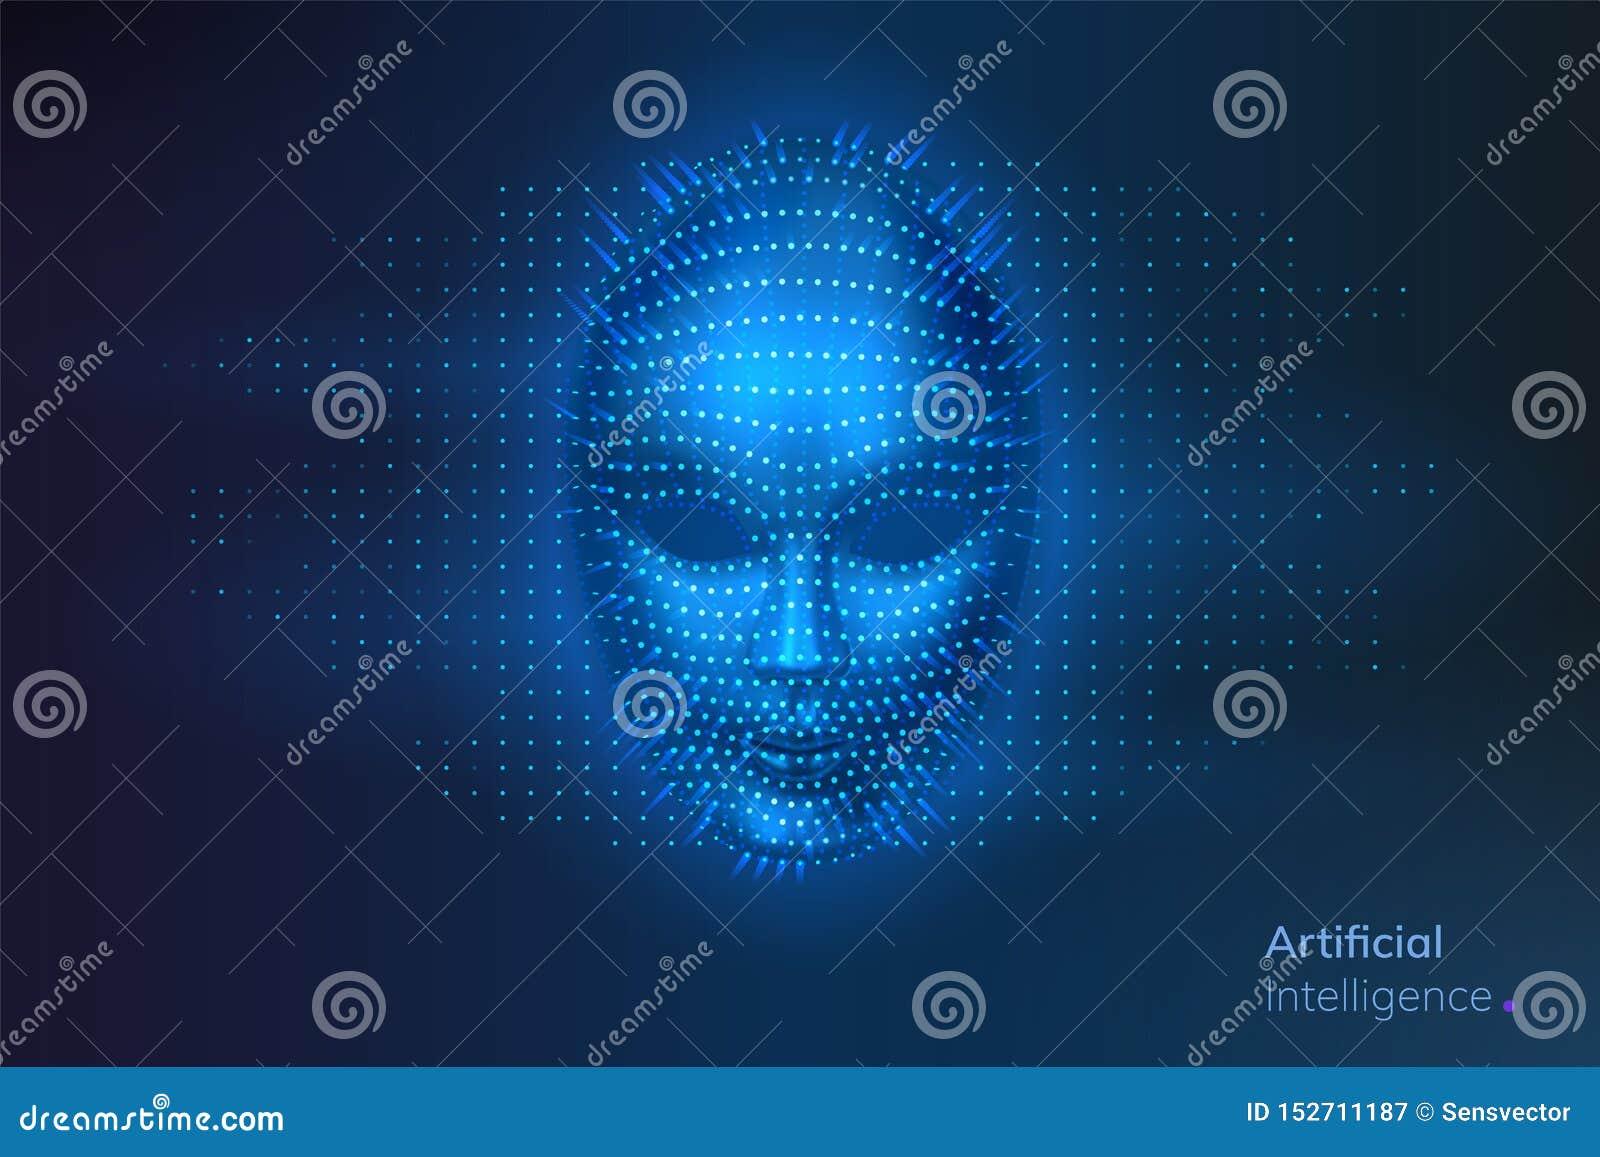 Kunstmatige intelligentie of AI, robot digitaal gezicht